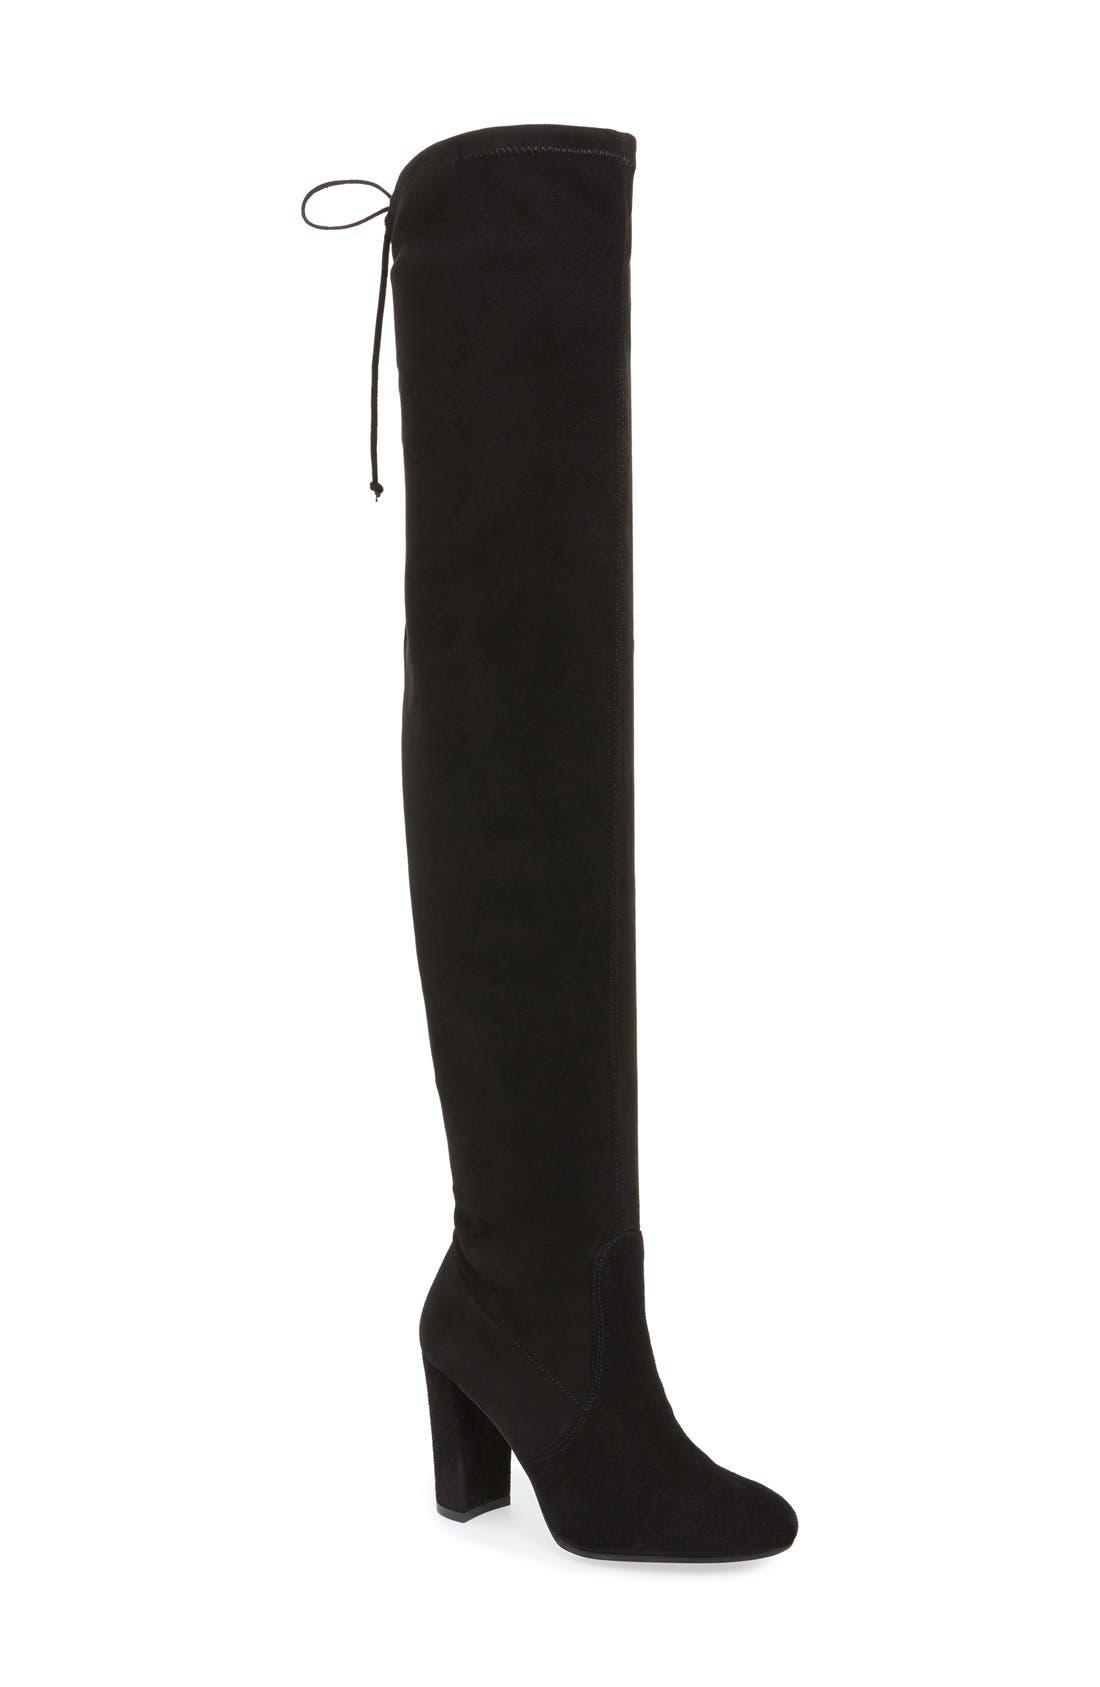 Main Image - Dune London Sibyl Over the Knee Boot (Women)